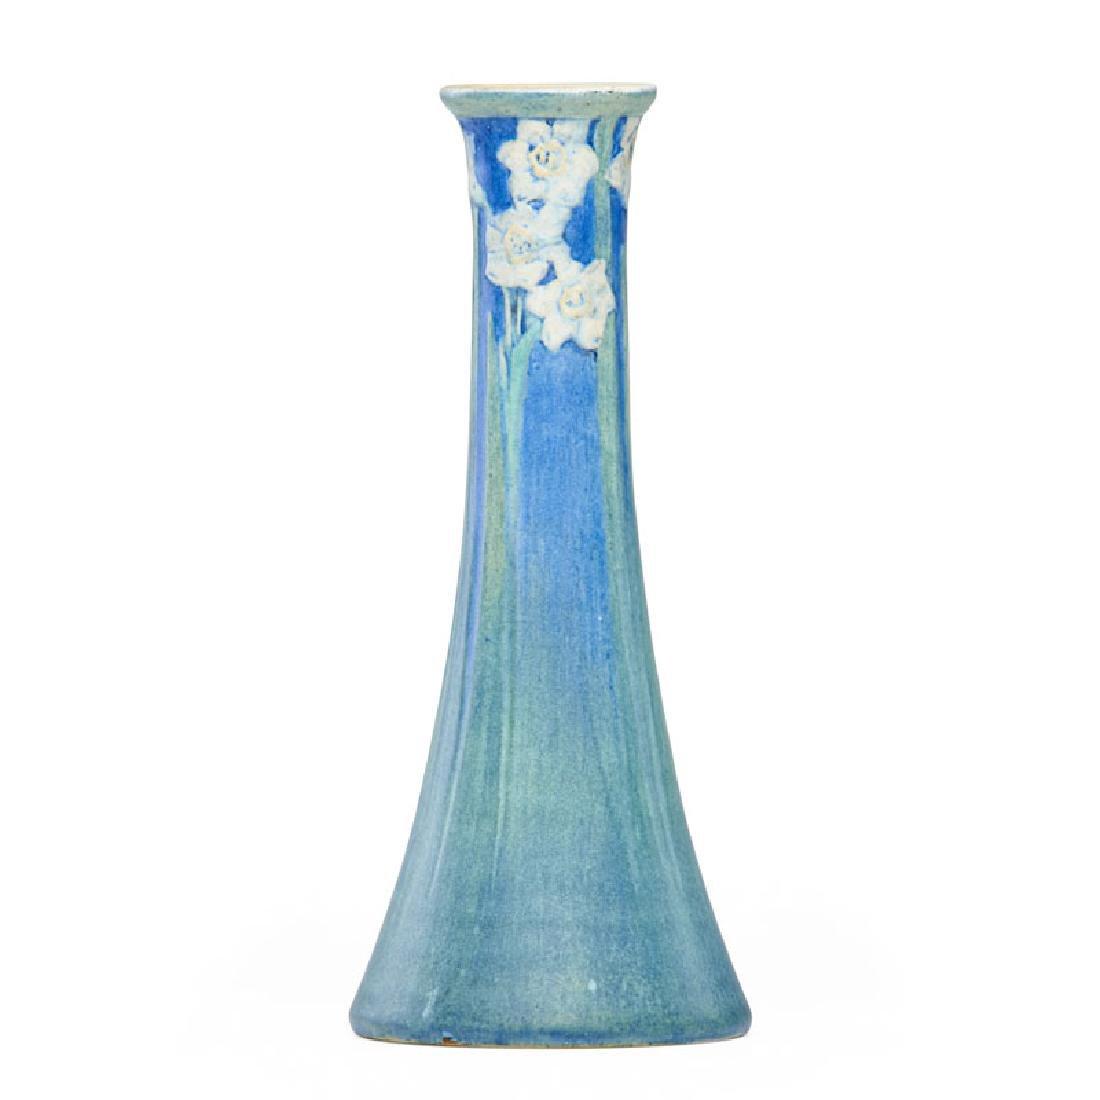 HENRIETTA BAILEY; NEWCOMB COLLEGE Tall vase